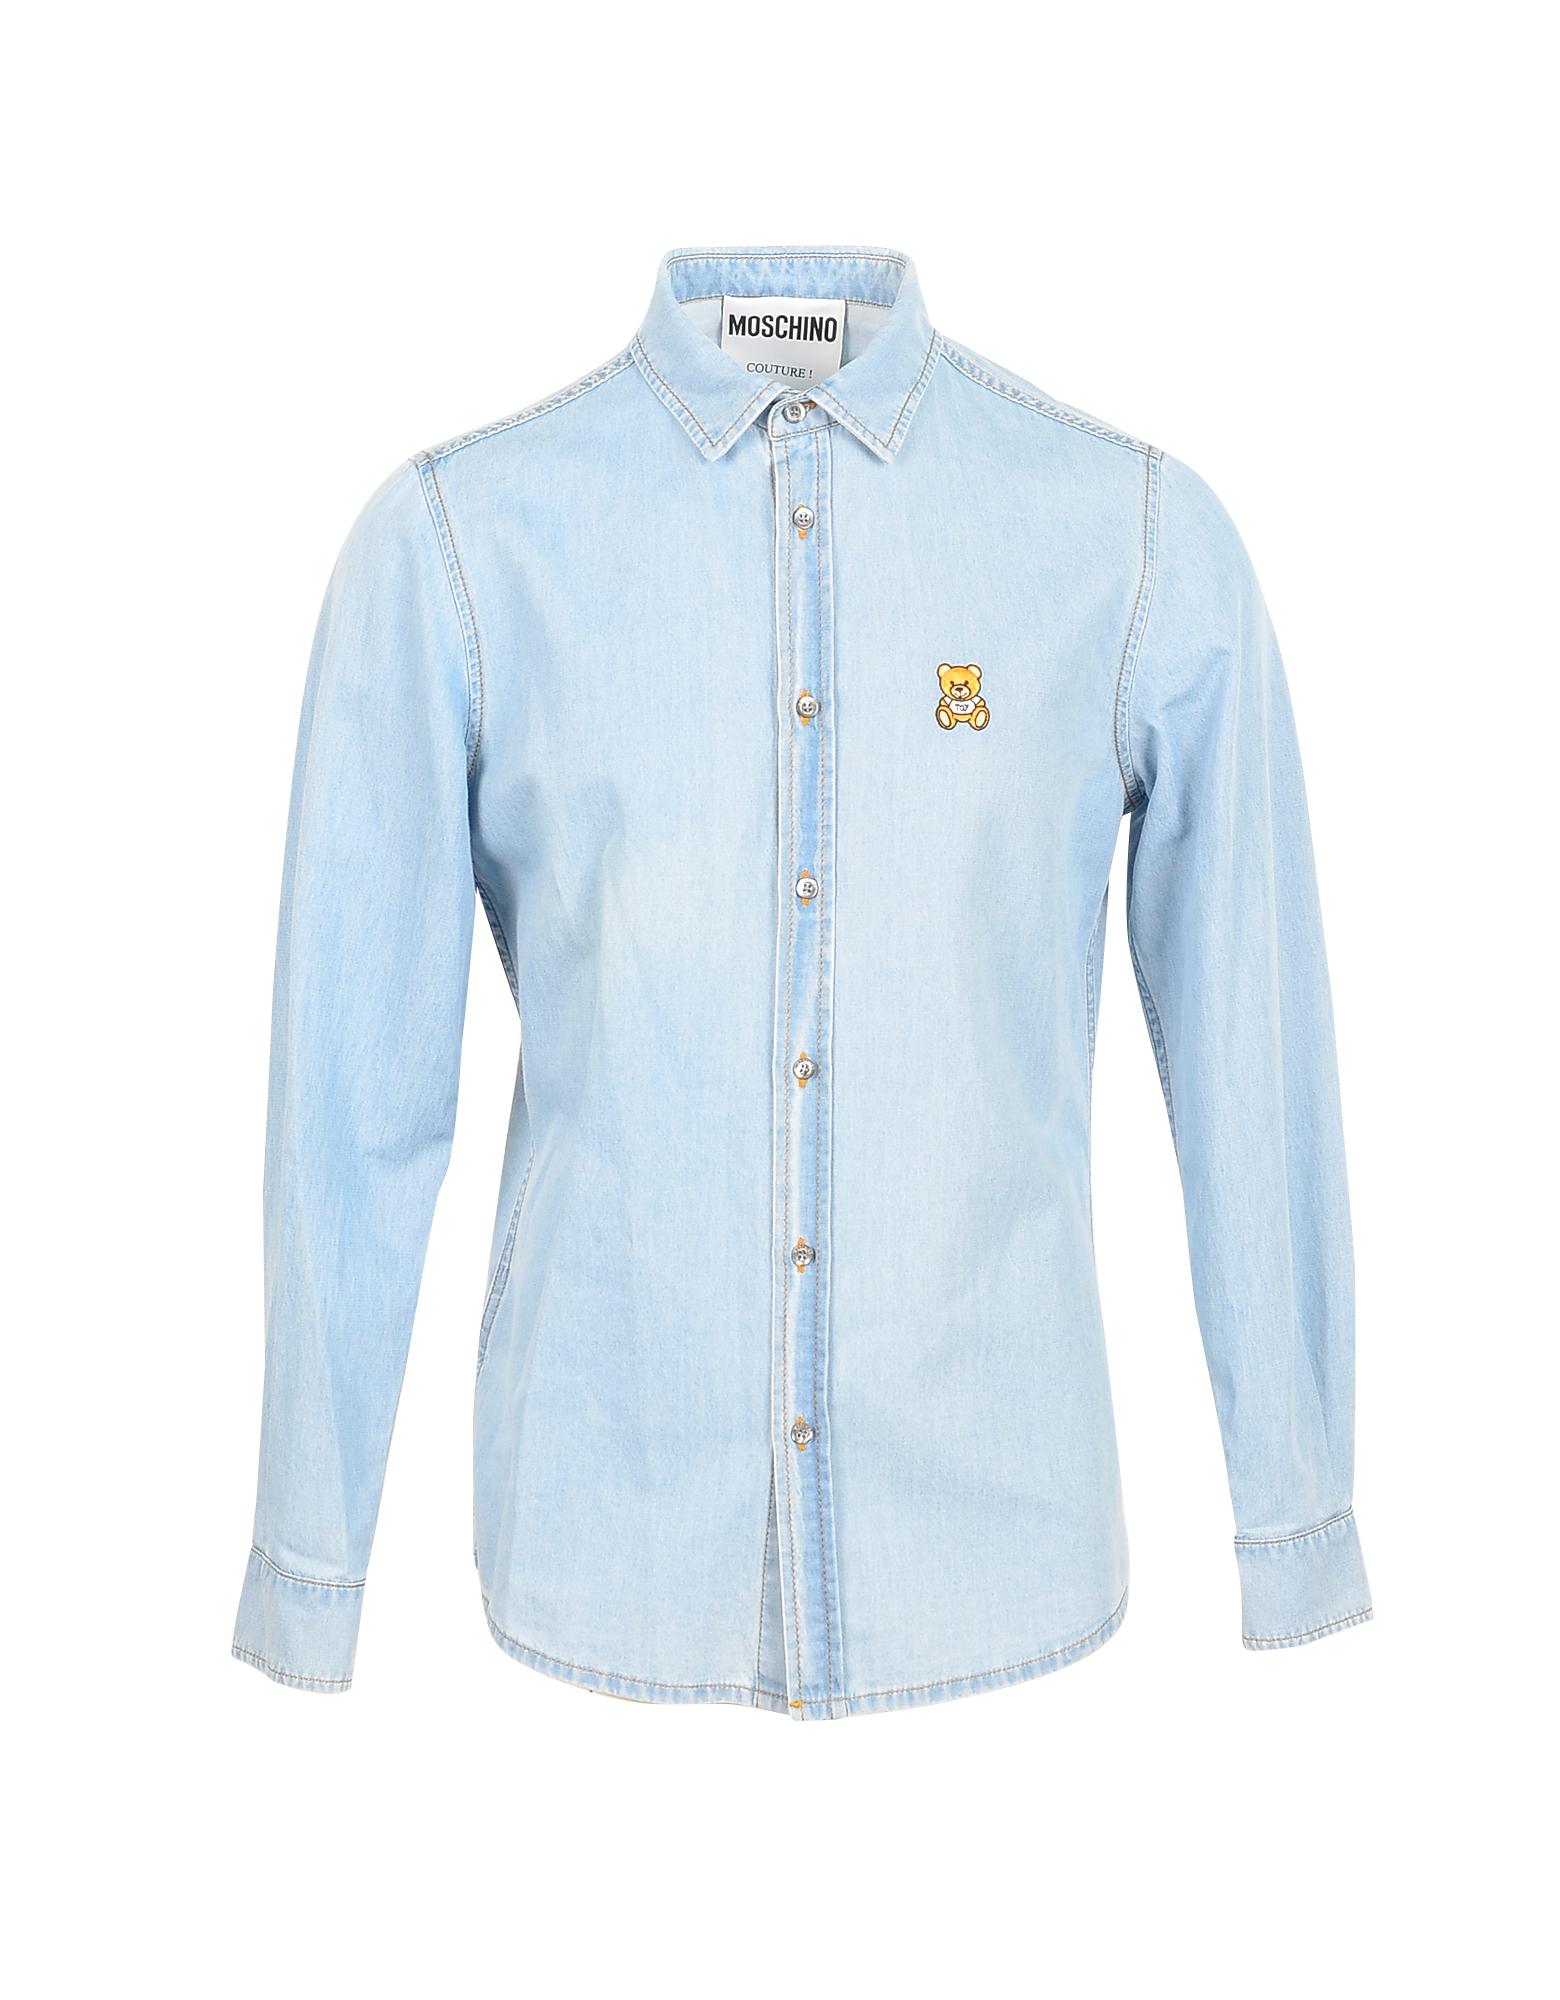 Moschino Designer Shirts, Light Blue Denim Men's Shirt w/Teddy Bear